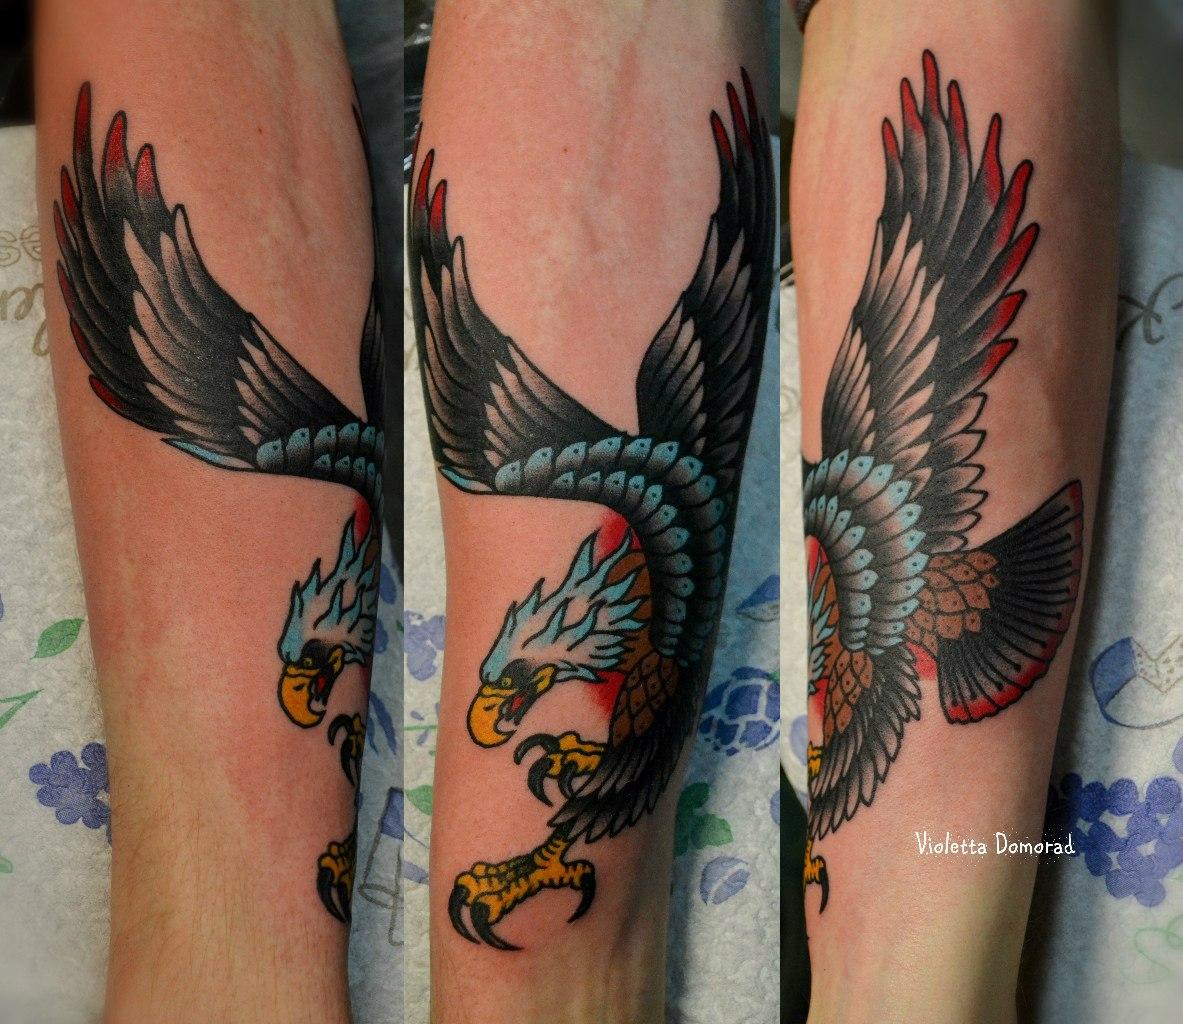 Татуировка Орел. Мастер Виолетта Доморад